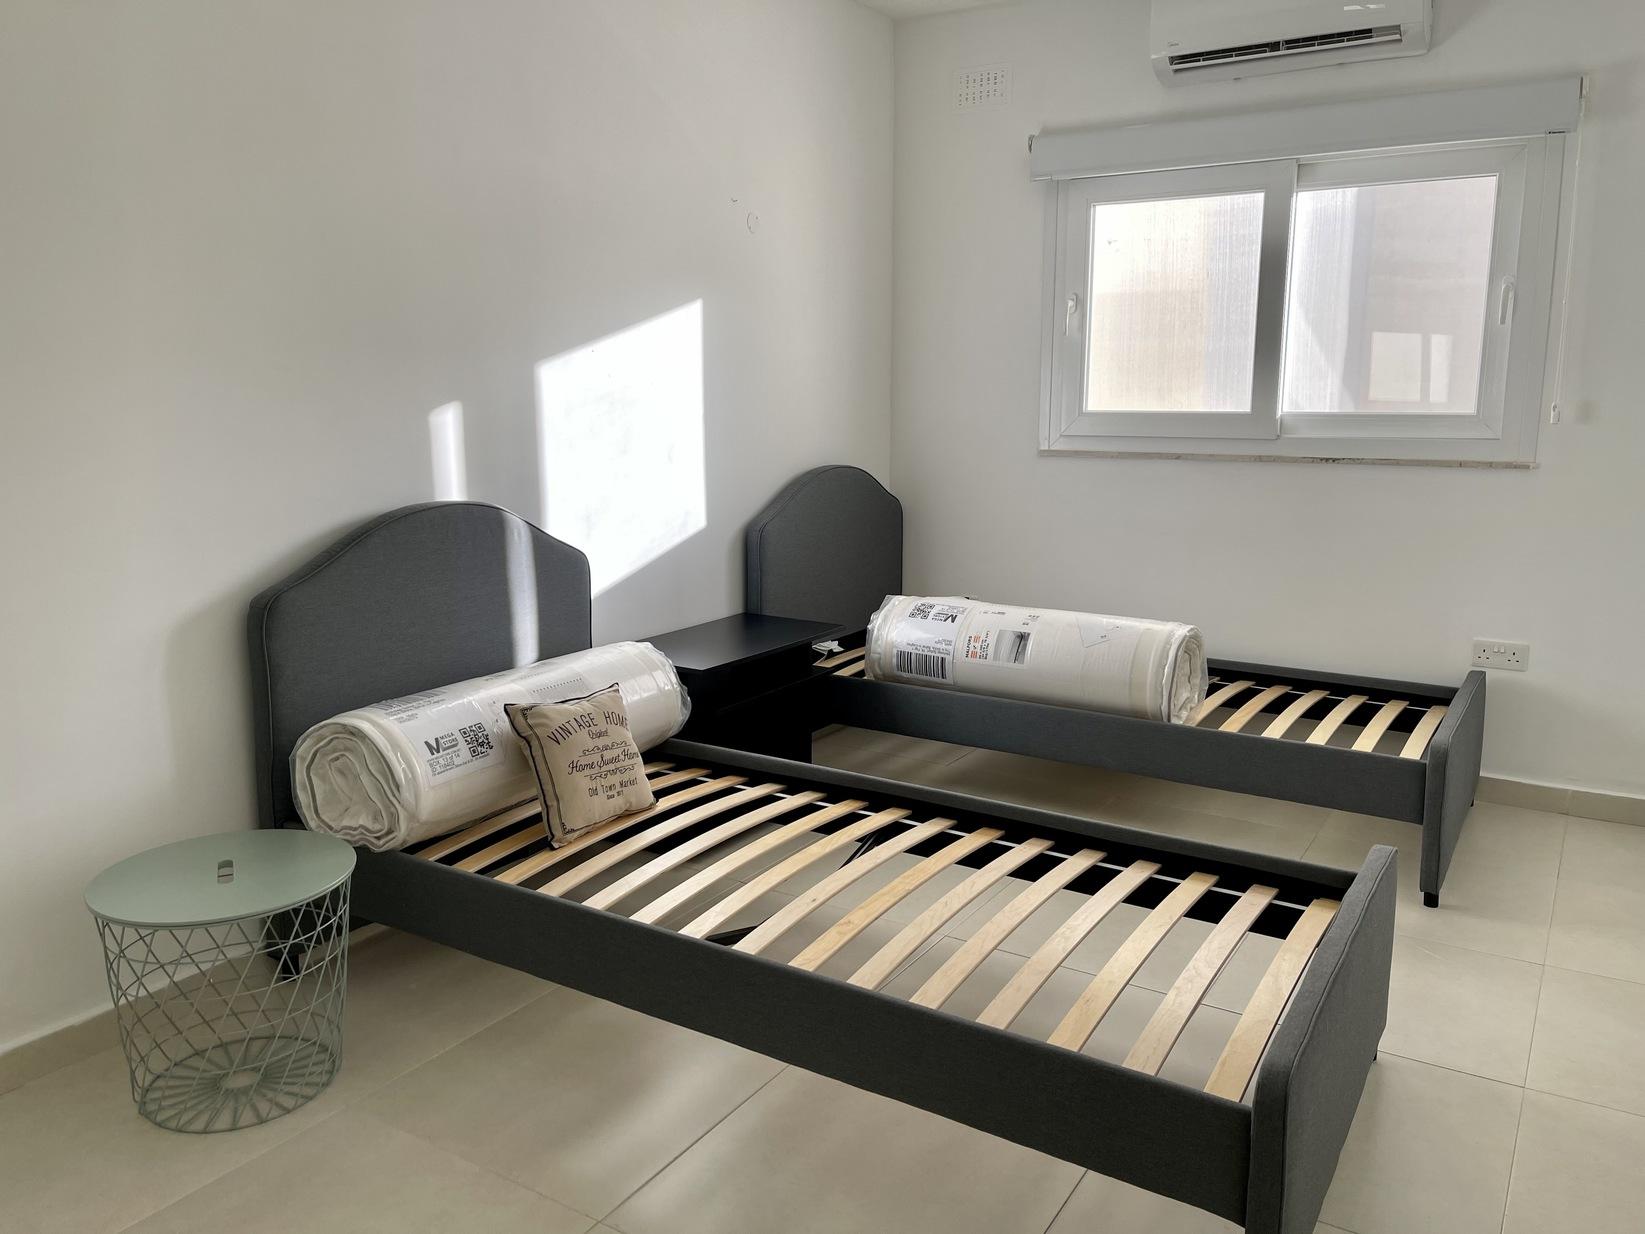 3 bed Apartment For Rent in Bahar Ic-Caghaq, Bahar ic-Caghaq - thumb 14